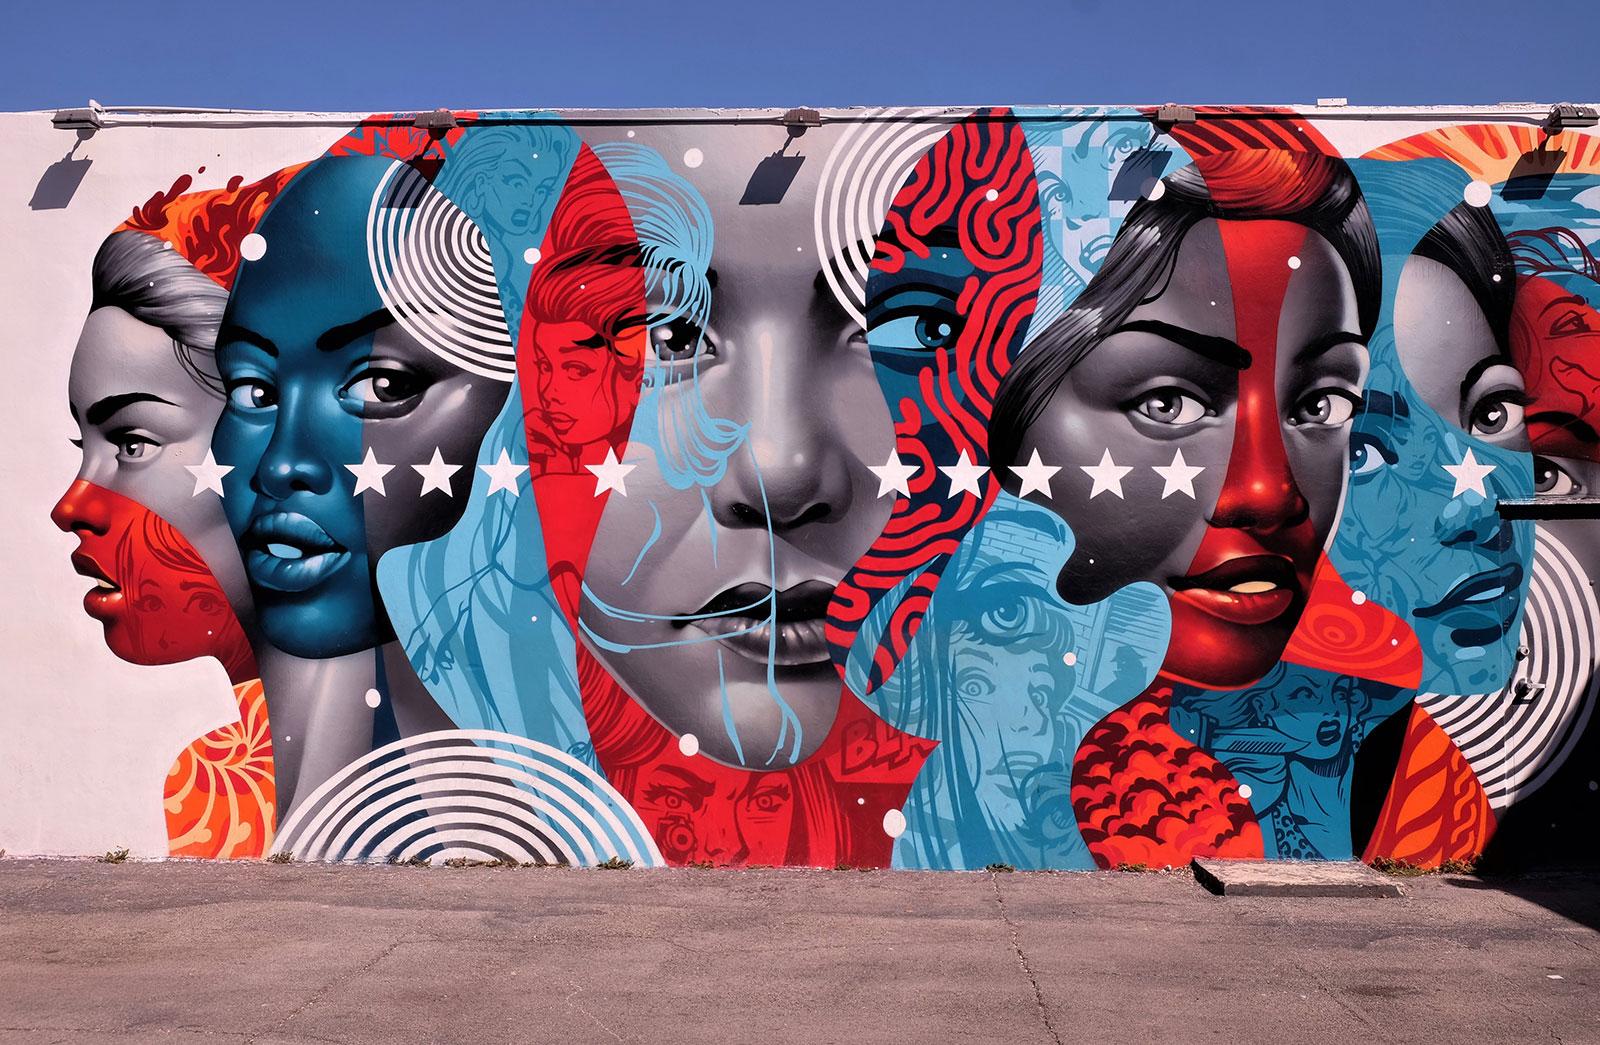 Mural in Wynwood, Miami, Florida: Tristan Eaton, 'American Power'